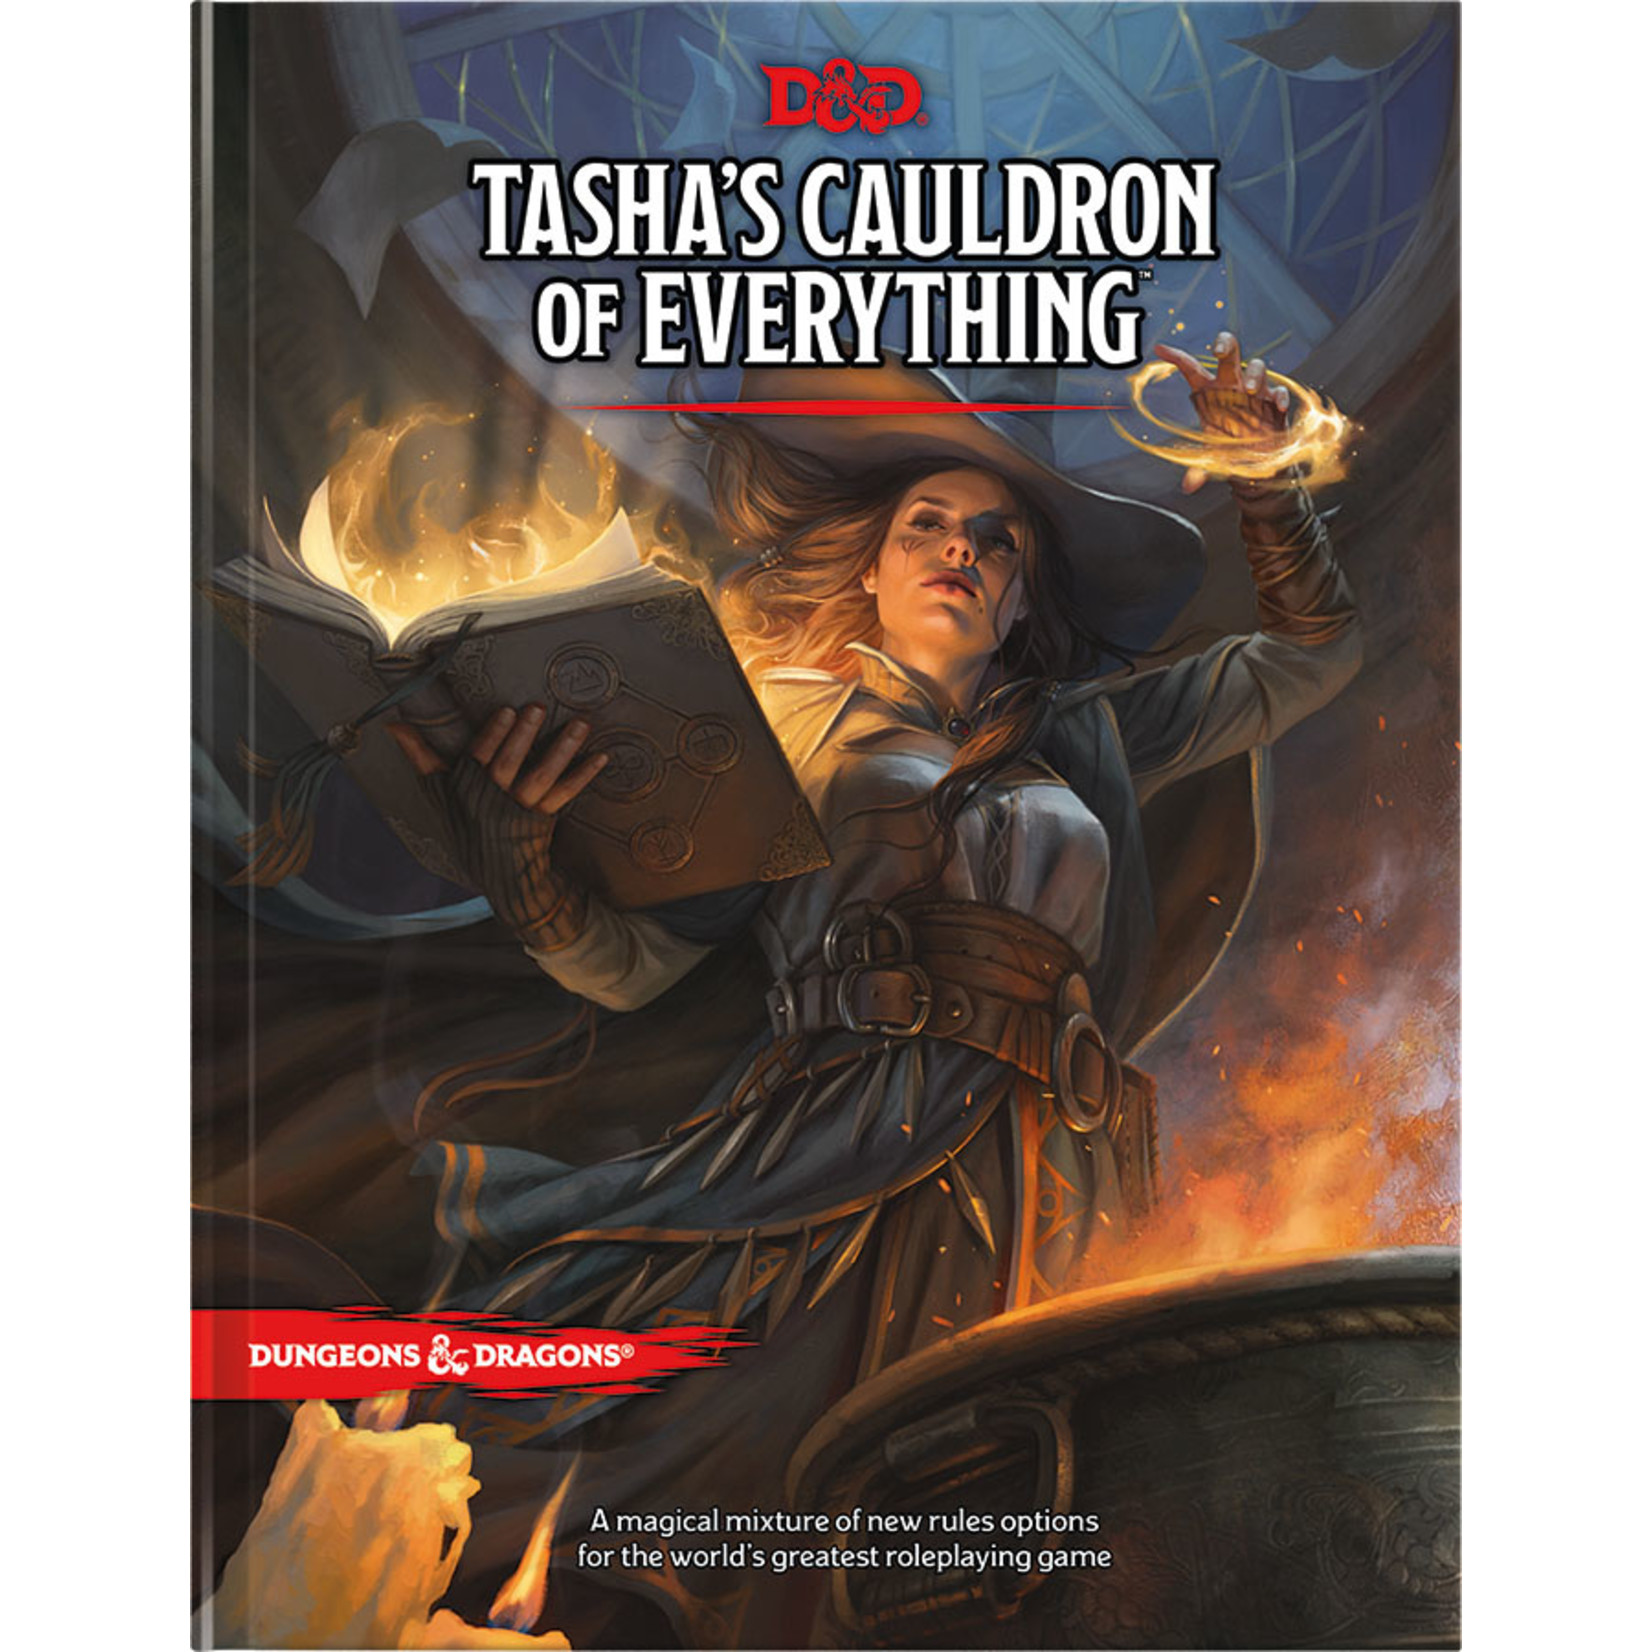 Dungeons & Dragons Dungeons & Dragons 5e Tasha's Cauldron of Everything (Regular Cover)